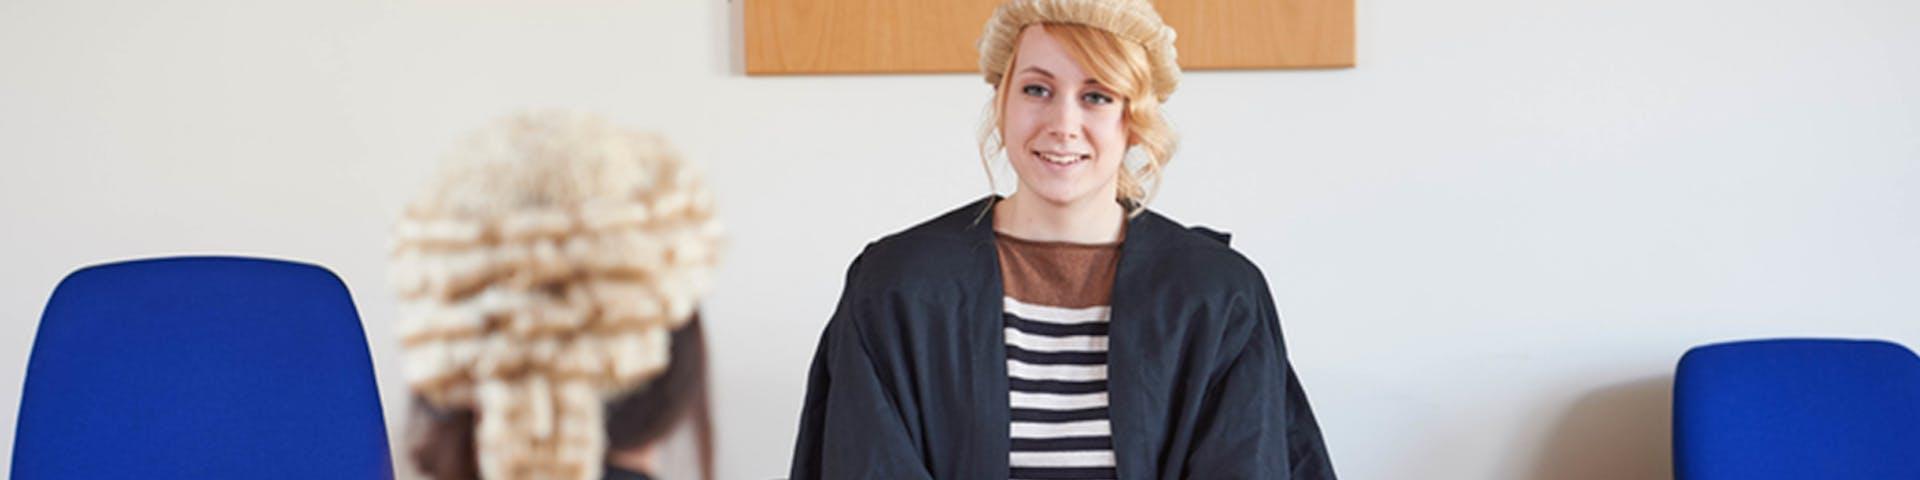 Fashion Design Hons B A Anglia Ruskin University Cambridge United Kingdom